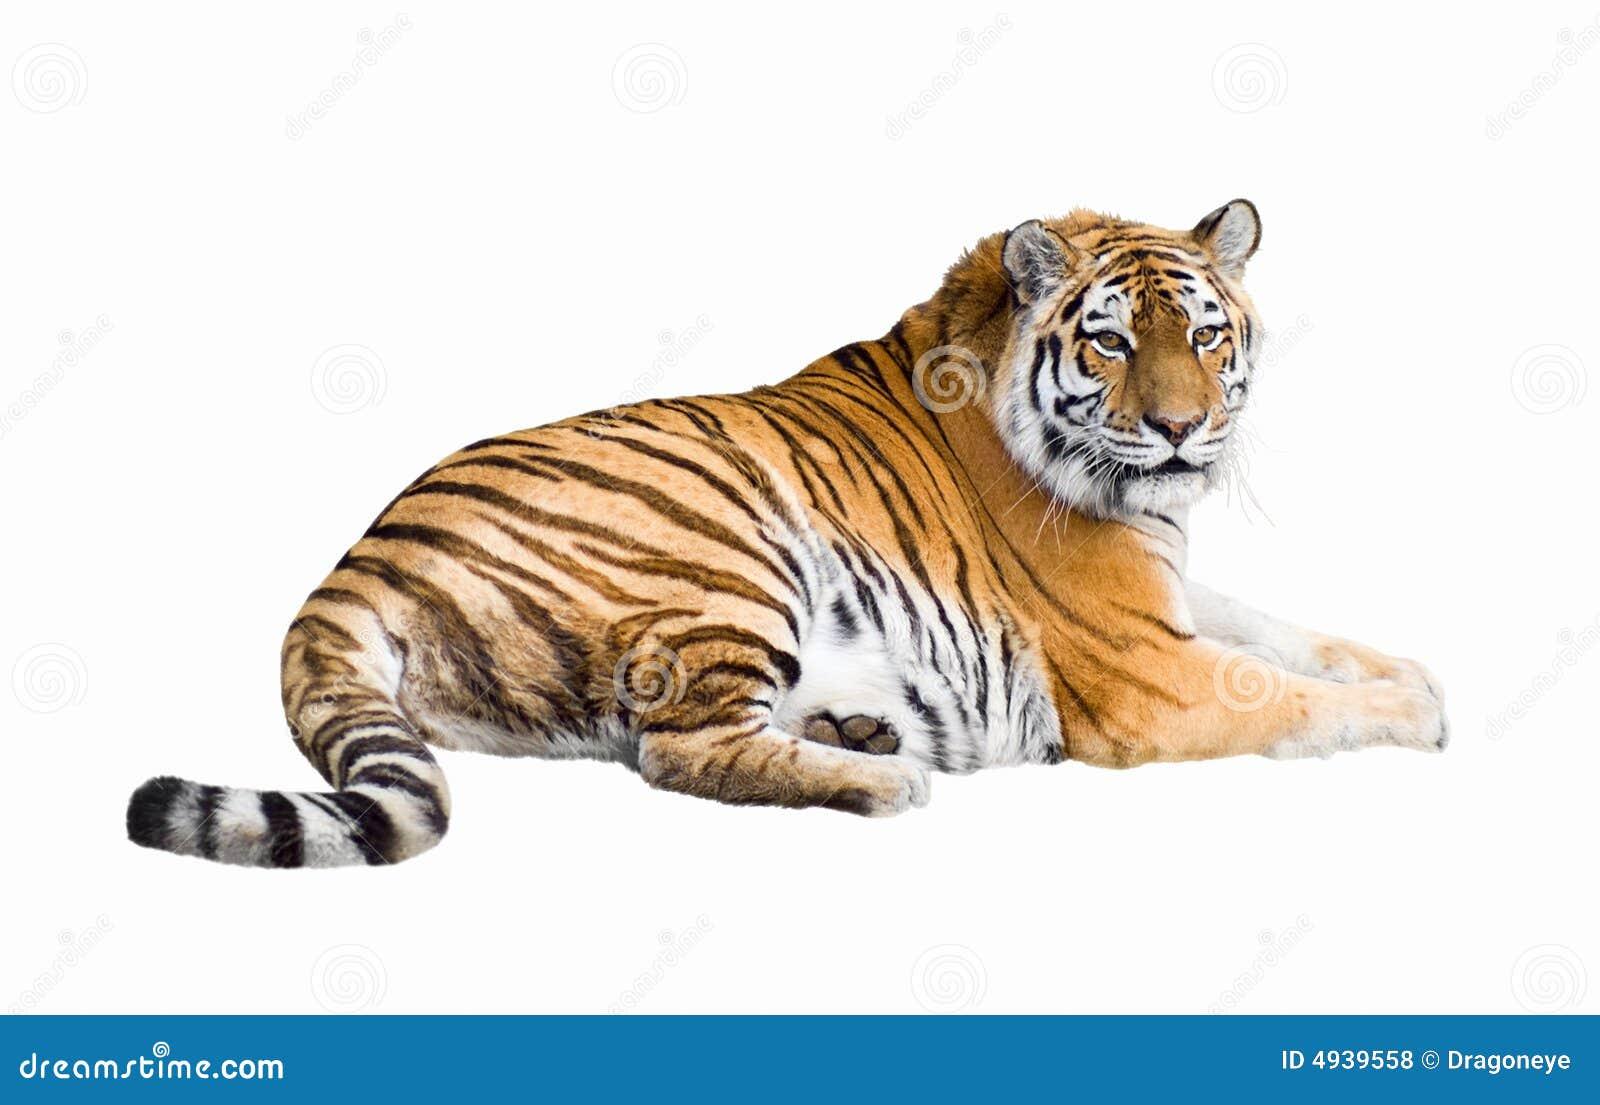 тигр сибиряка выреза